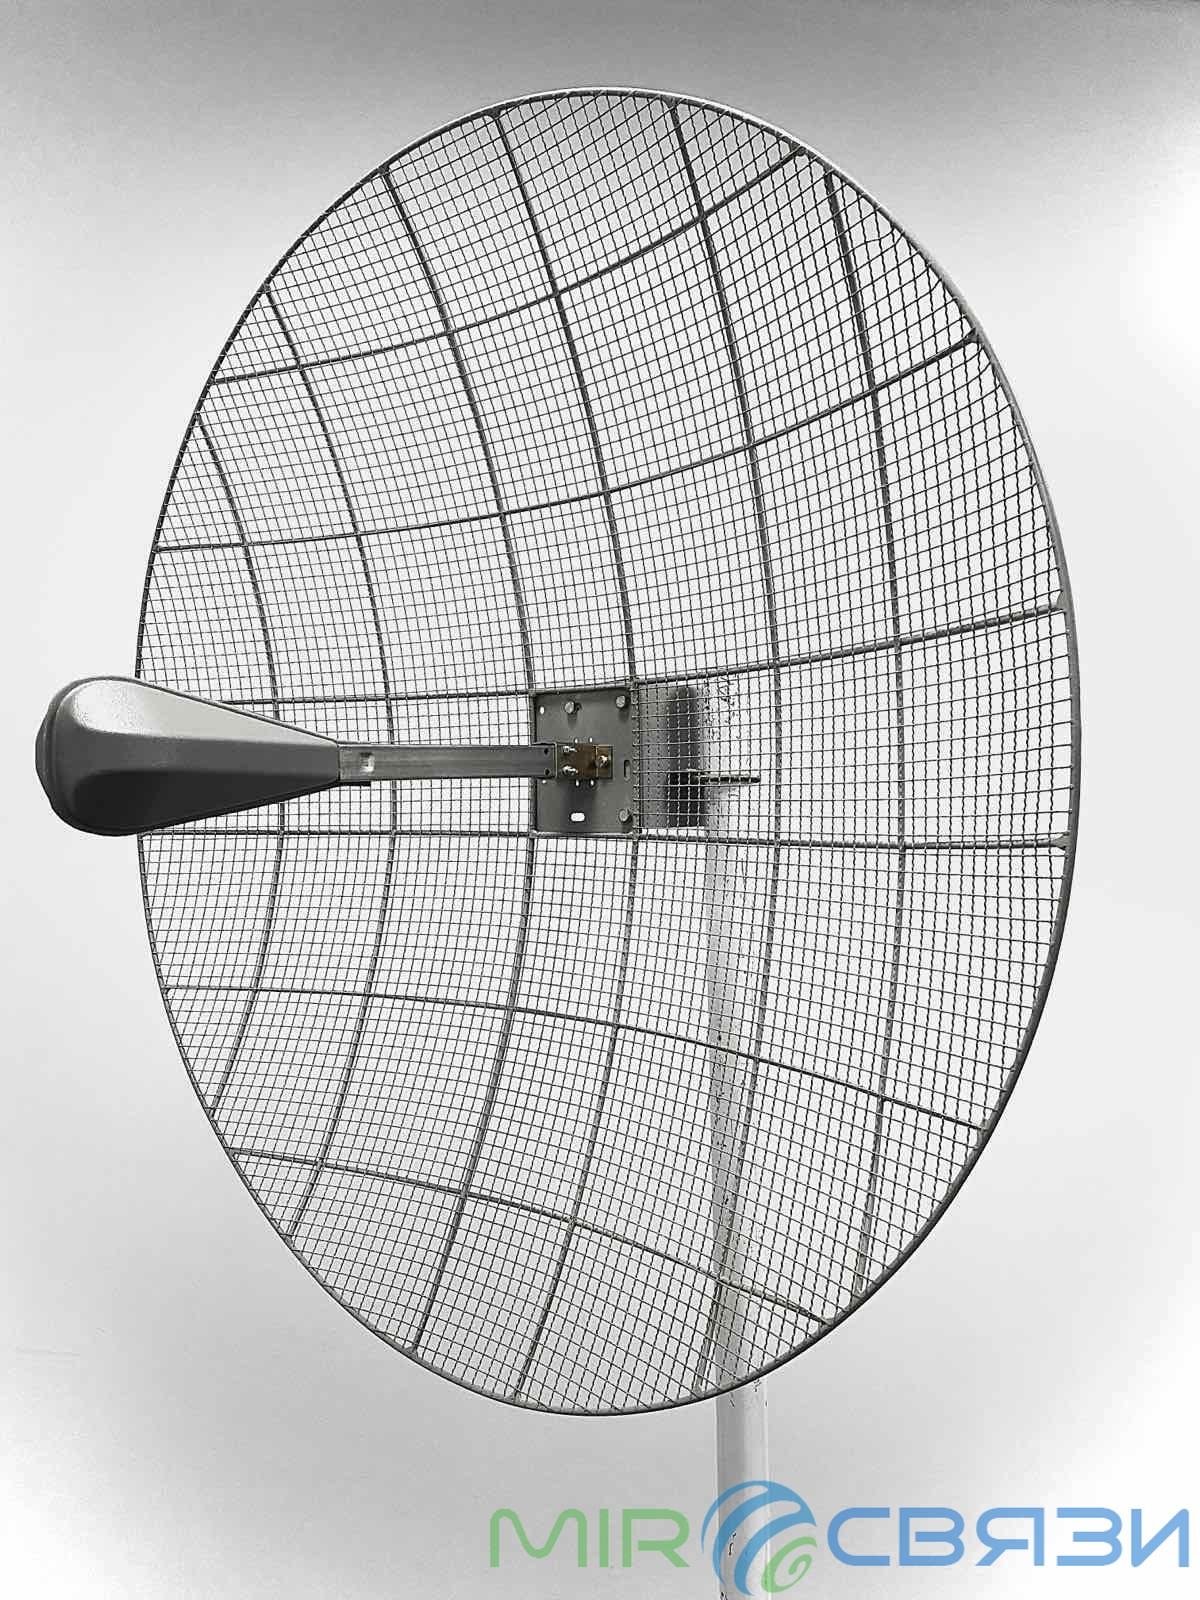 KROKS Антенна 3G/4G парабола KNA30 MIMO 1700/2700